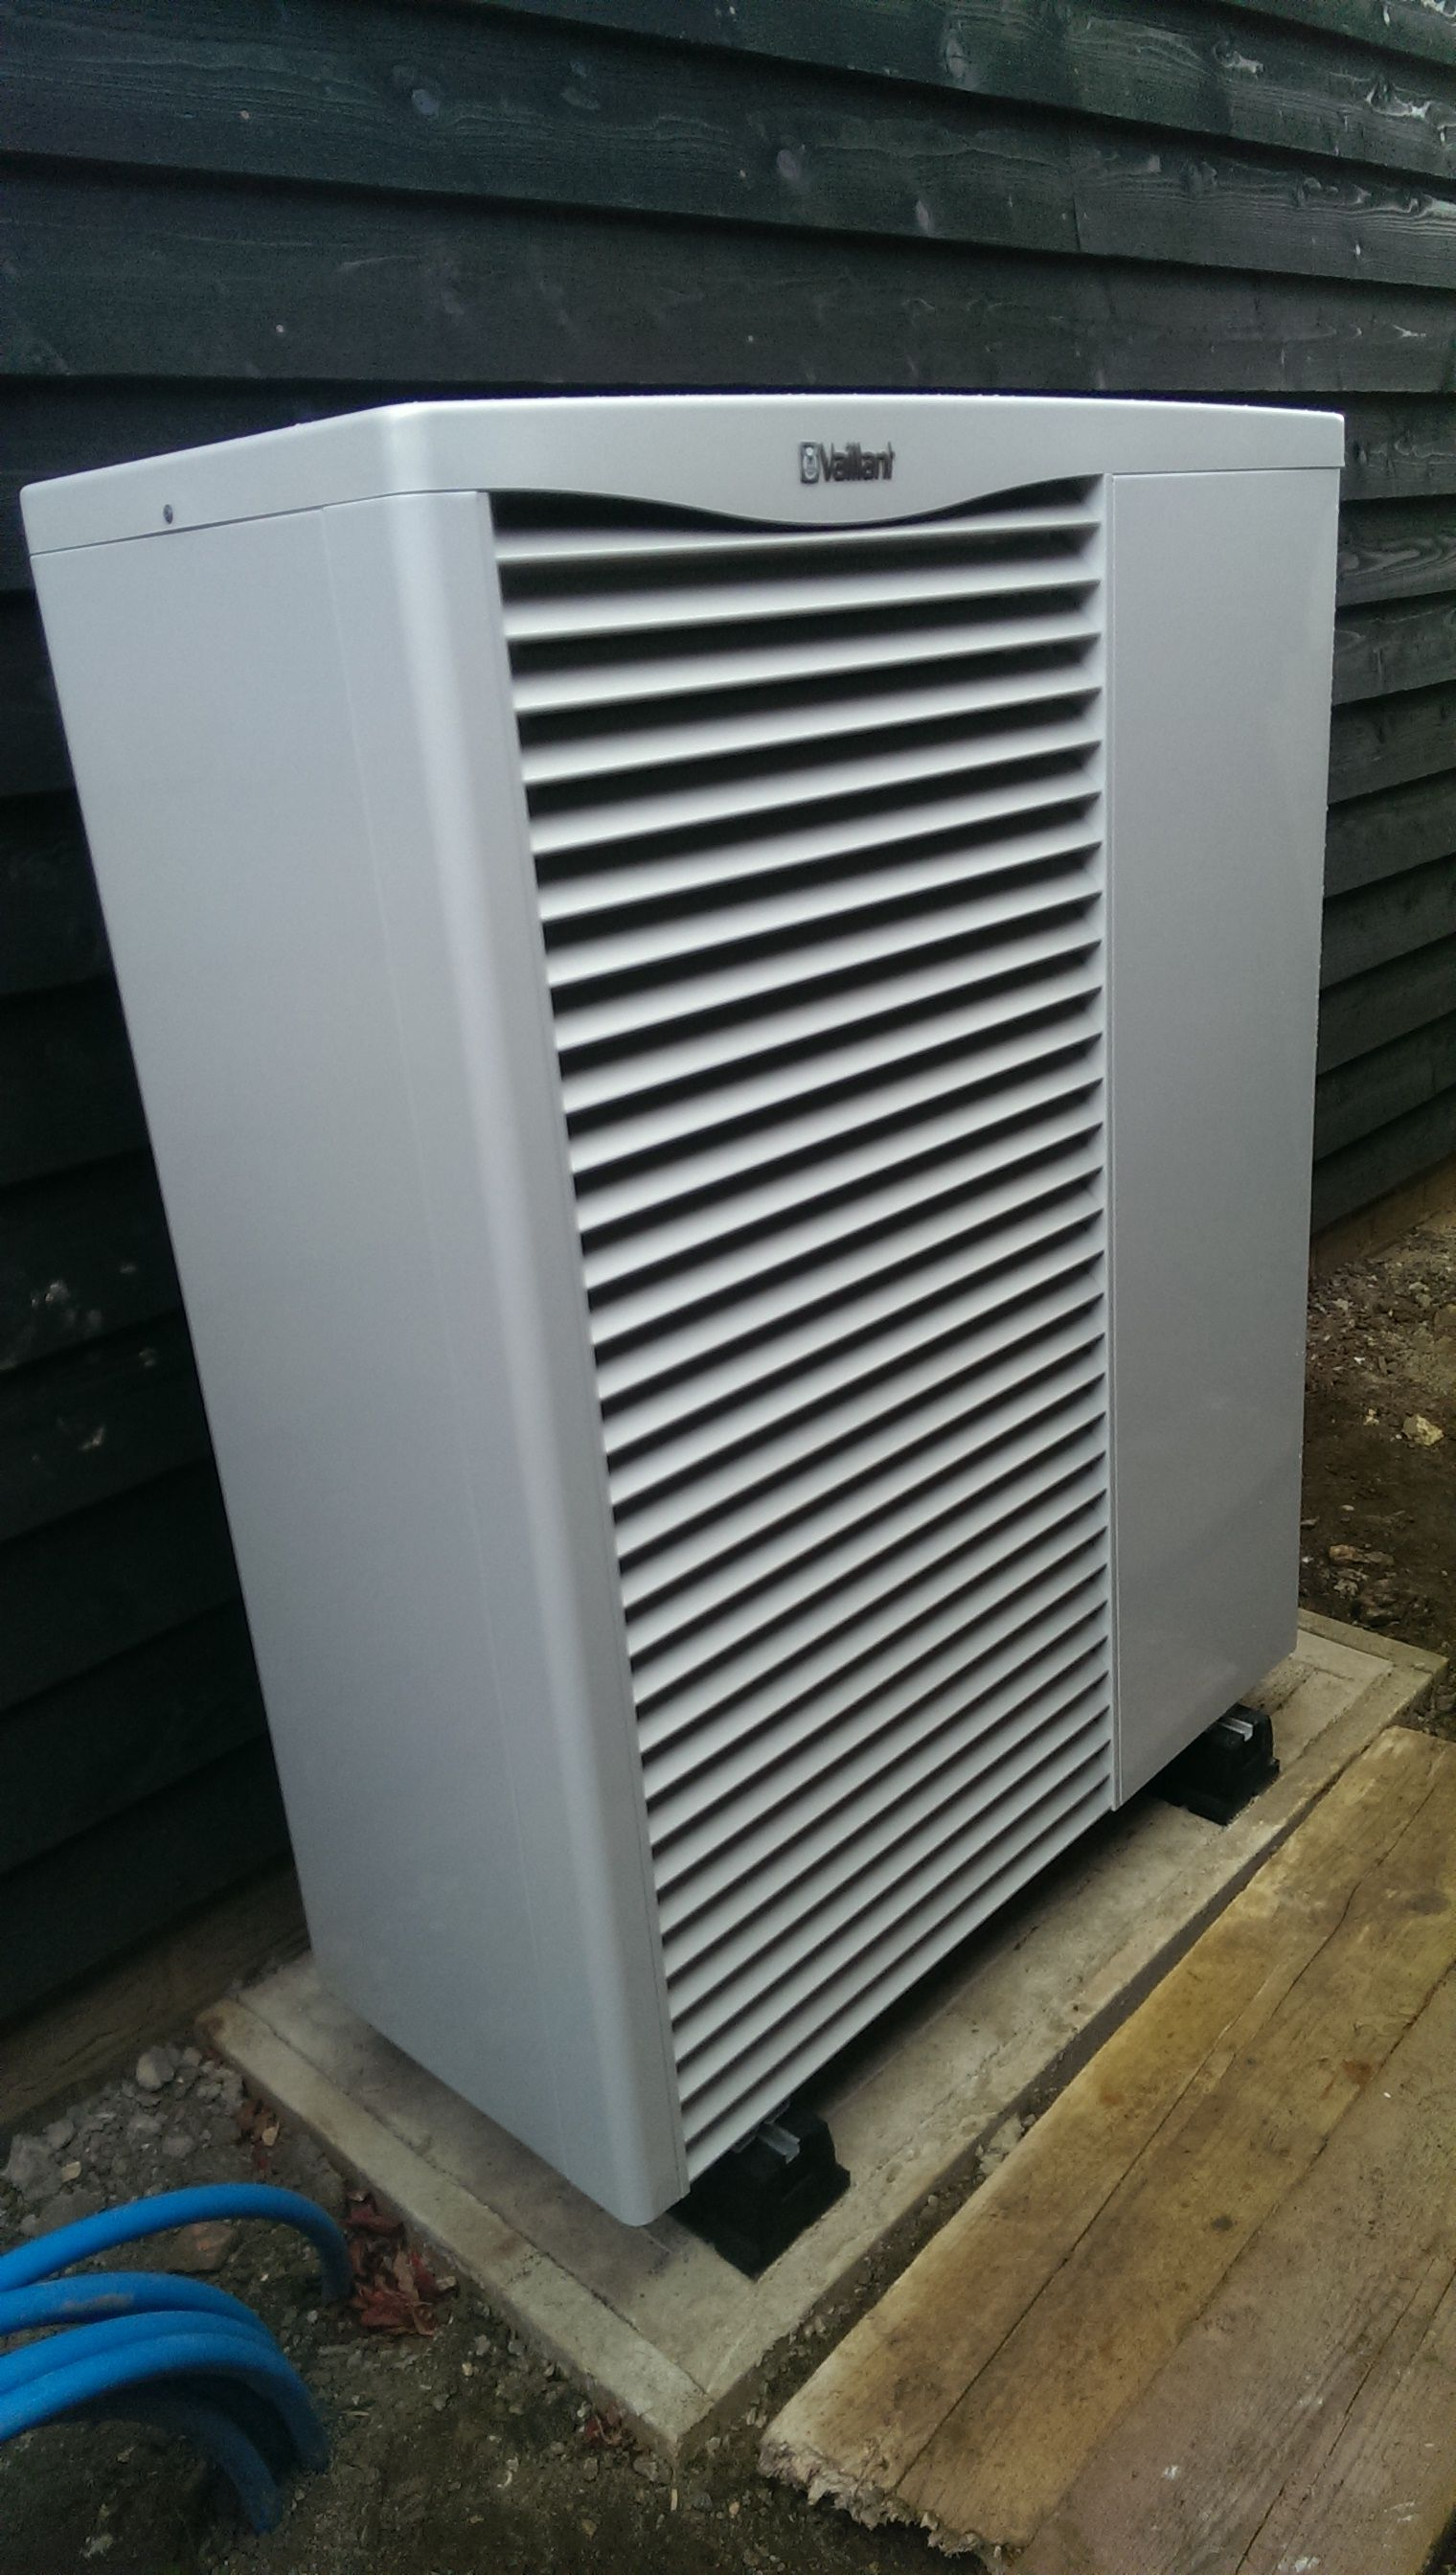 Vaillant Air Source Heat Pump installed in Haddneham, Ely